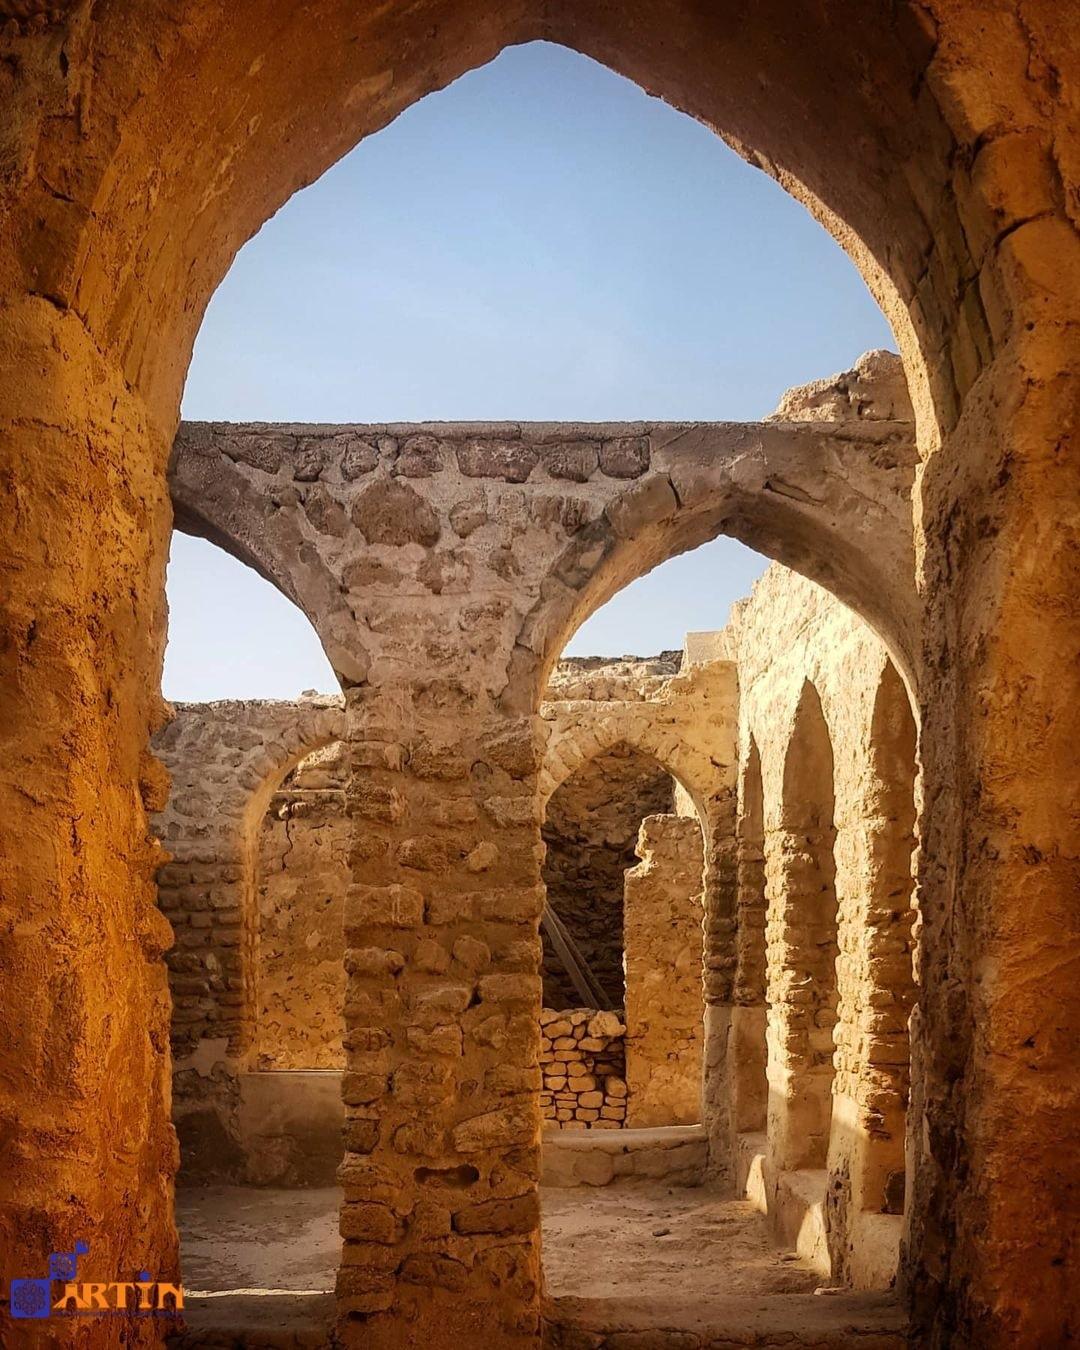 Harireh ancient city in Kish island